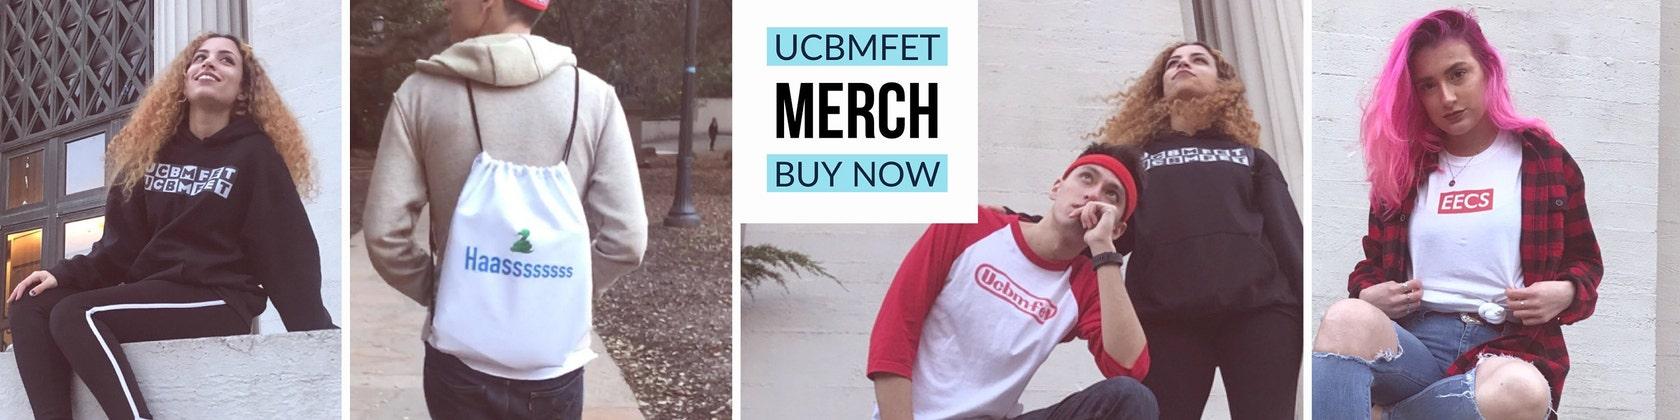 UC Berkeley Memes for Edgy Teens Merch by BerkeleySpecial on